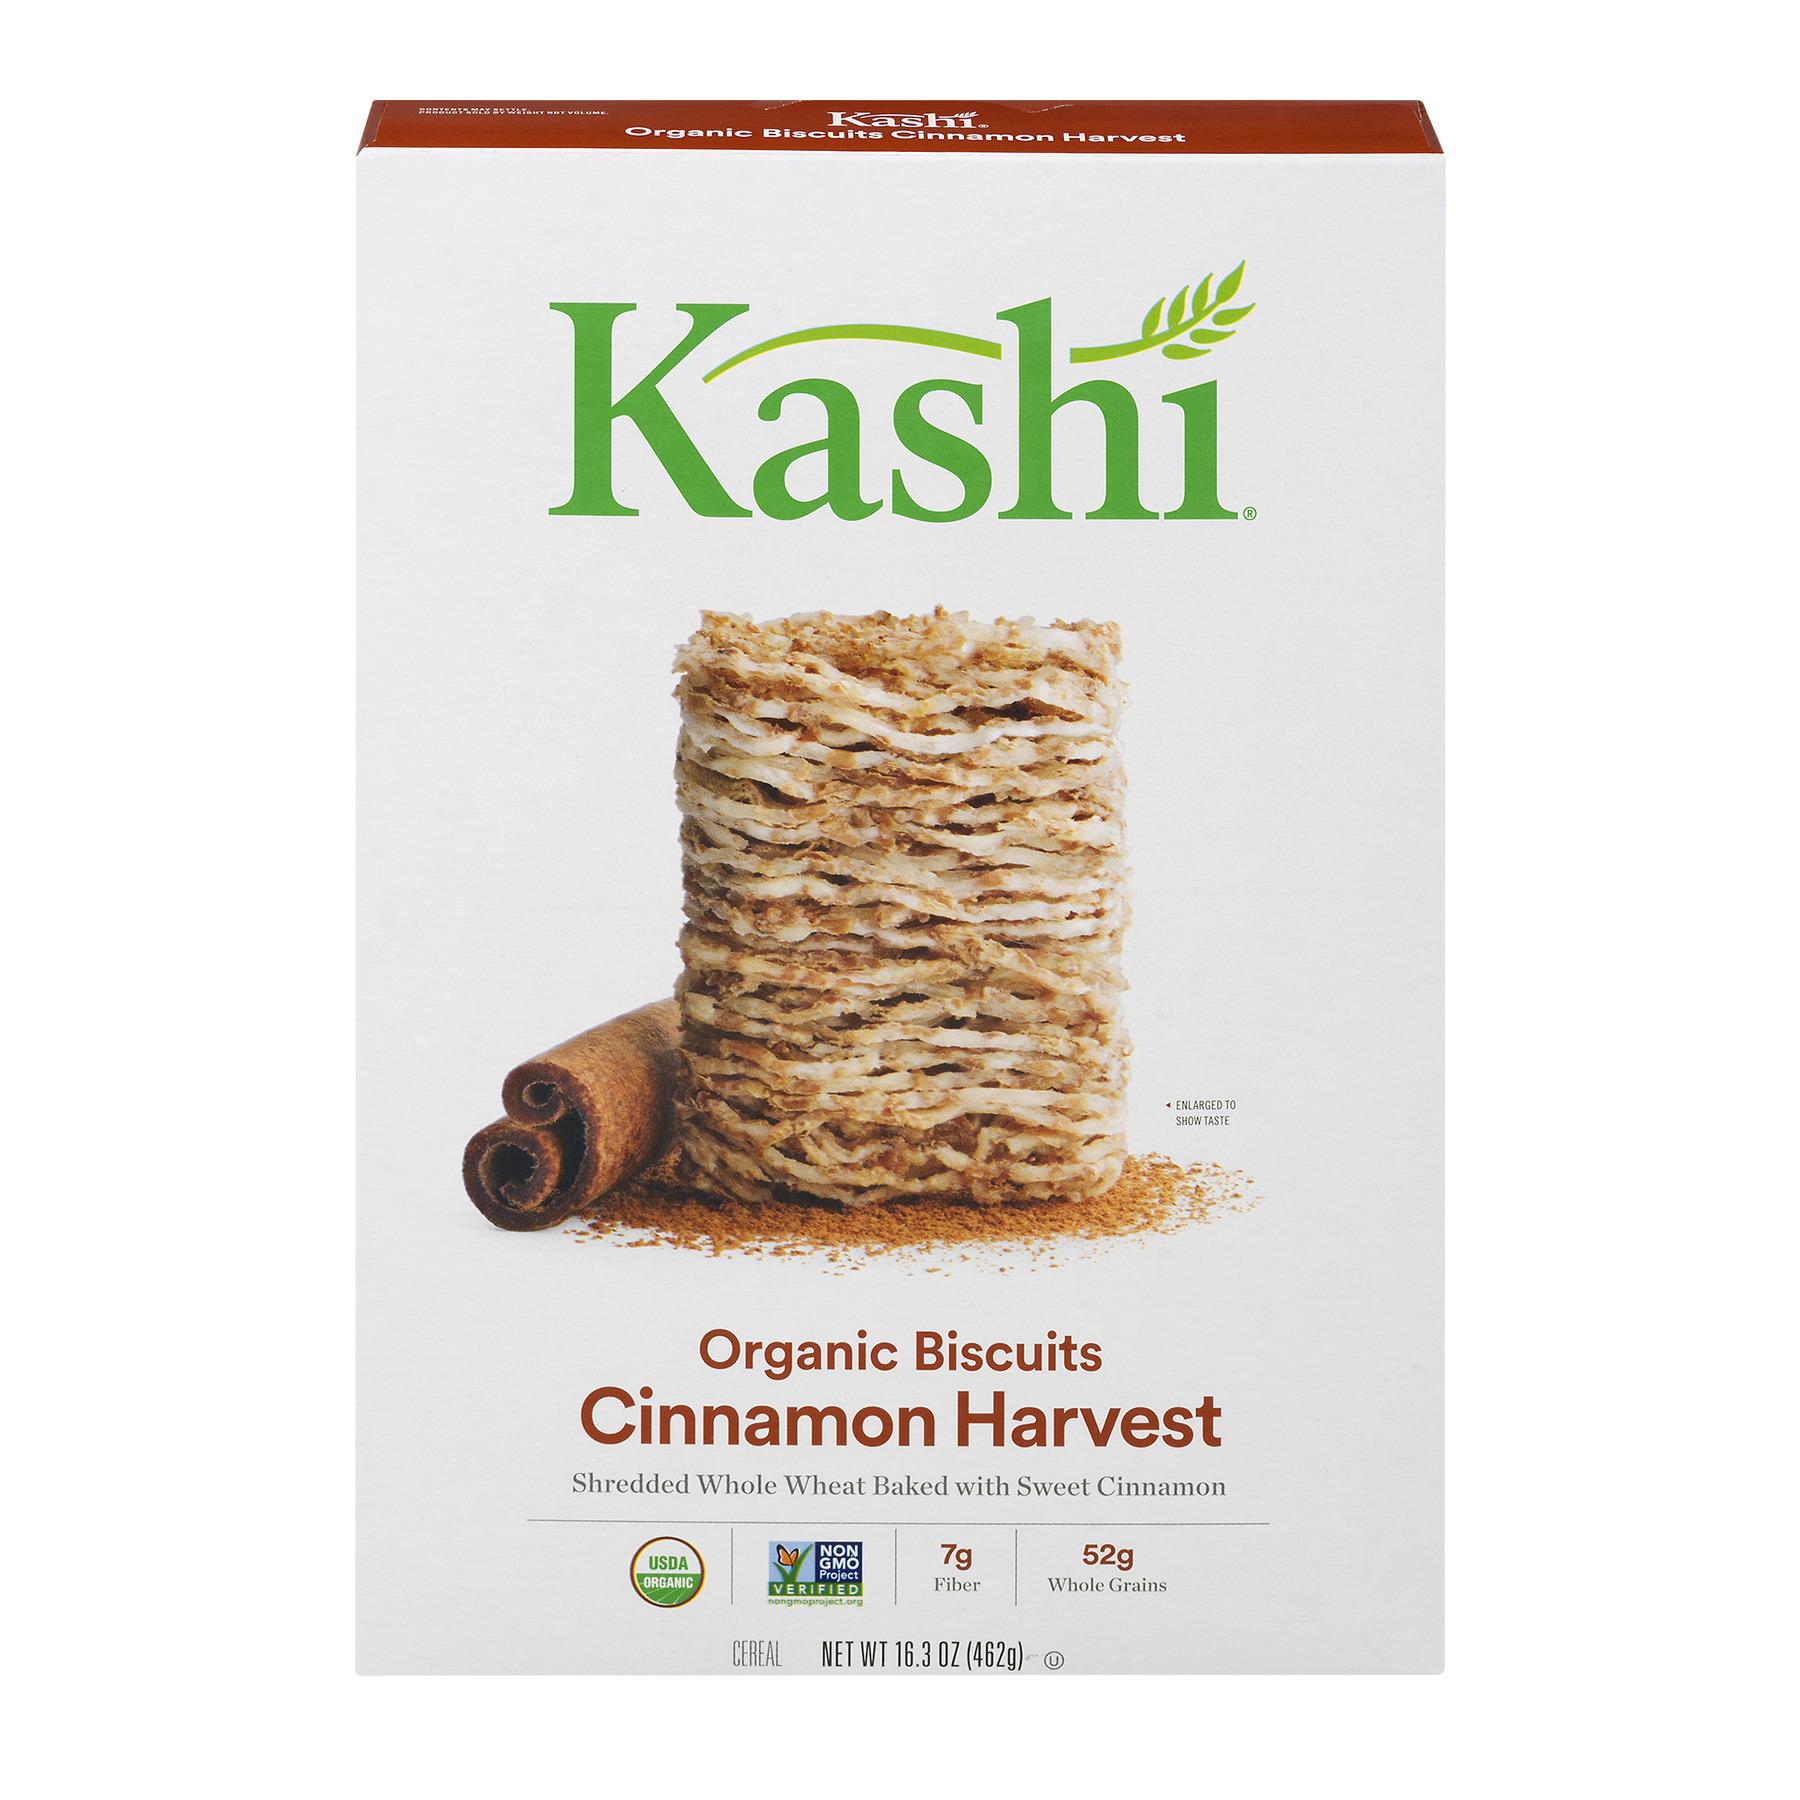 Kashi Organic Biscuits Breakfast Cereal, Cinnamon Harvest, 16.3 Oz